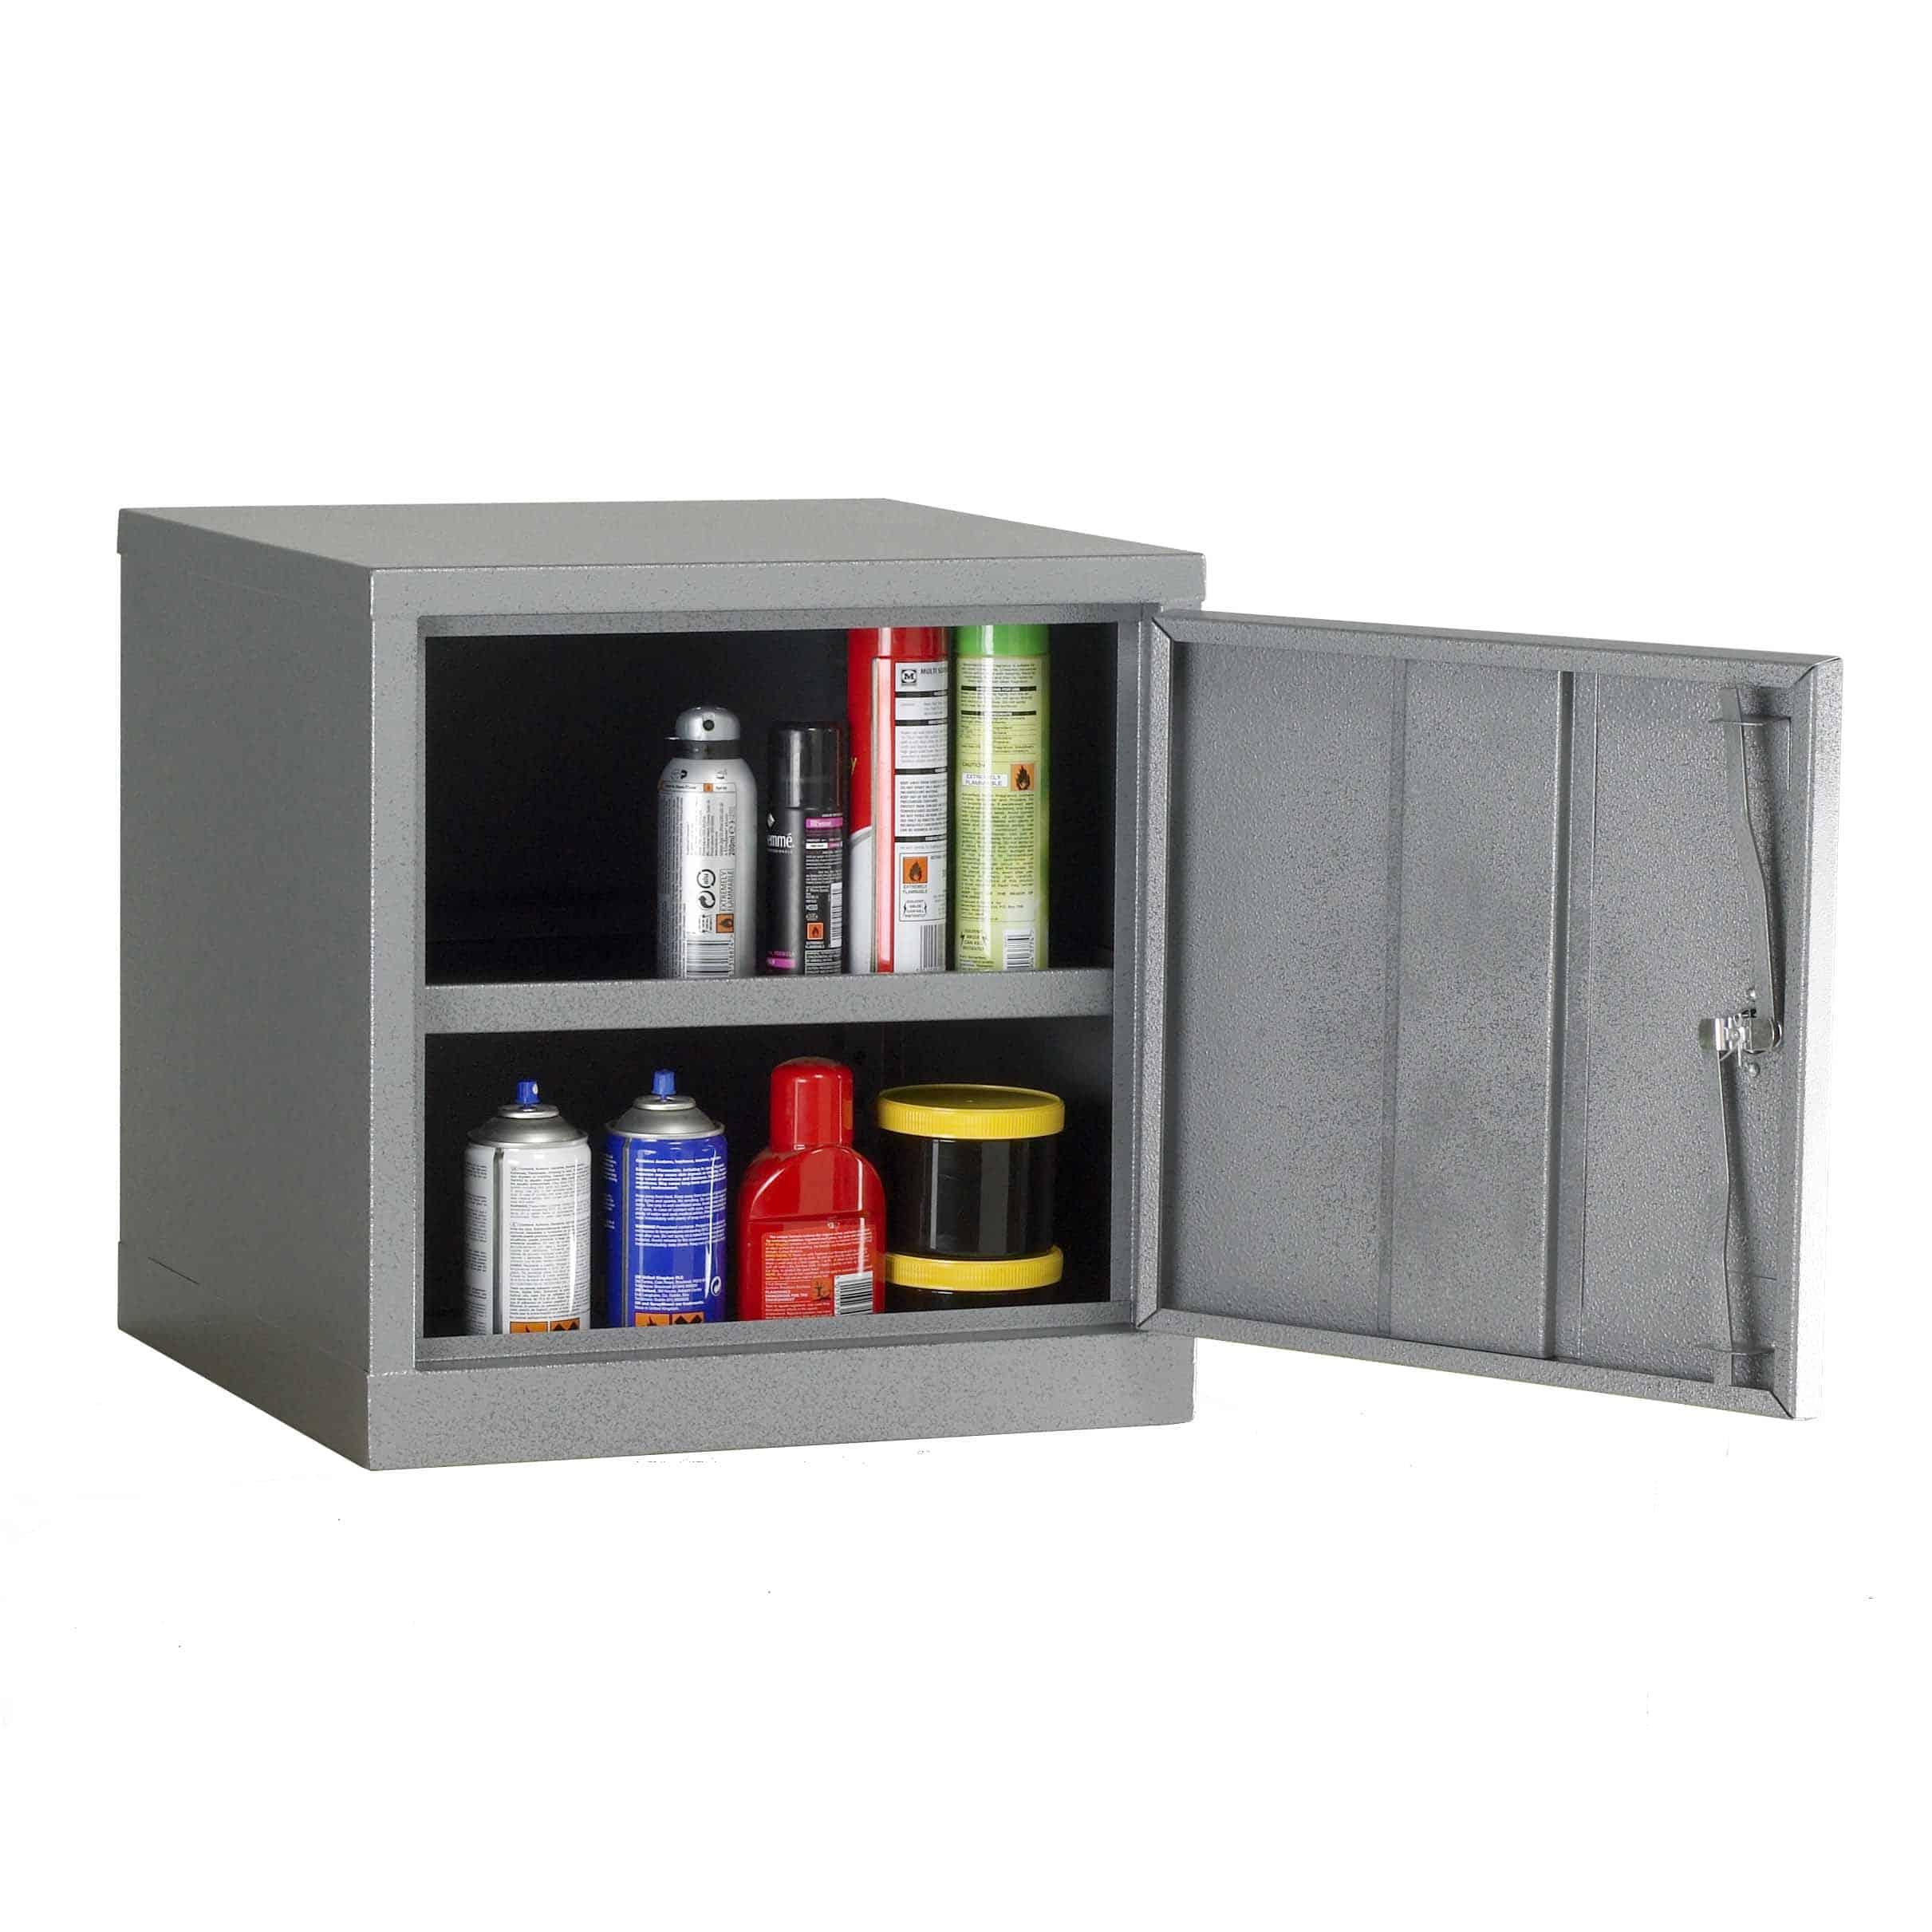 SU14C COSHH Storage Cabinets